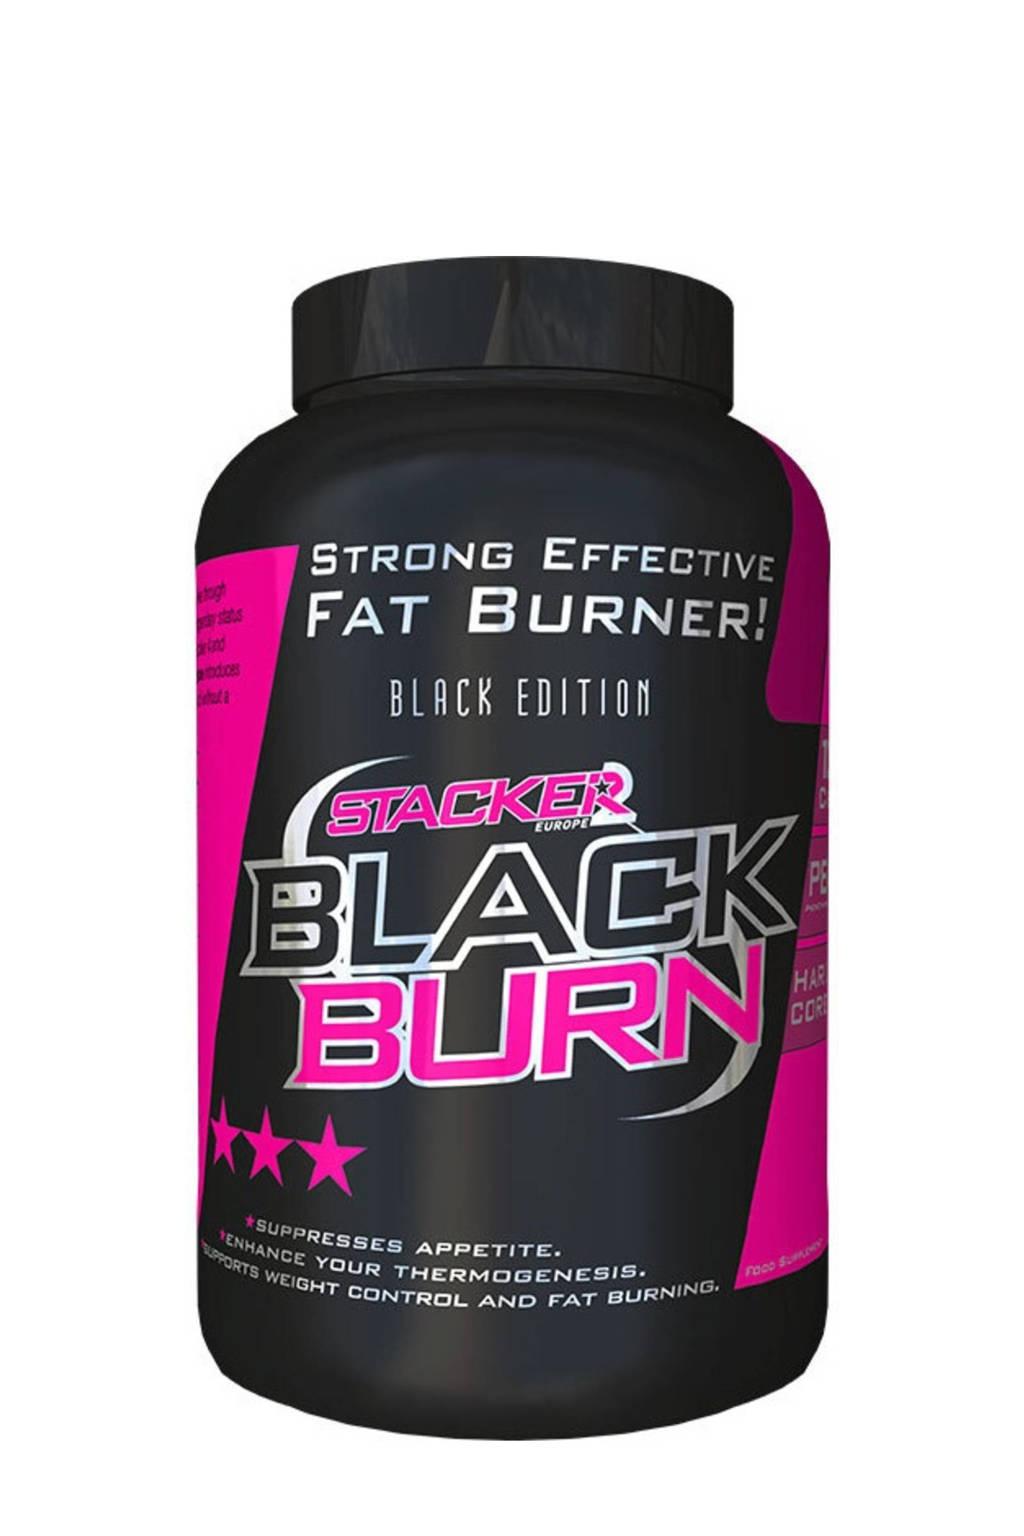 Stacker Black Burn - 120 capsules